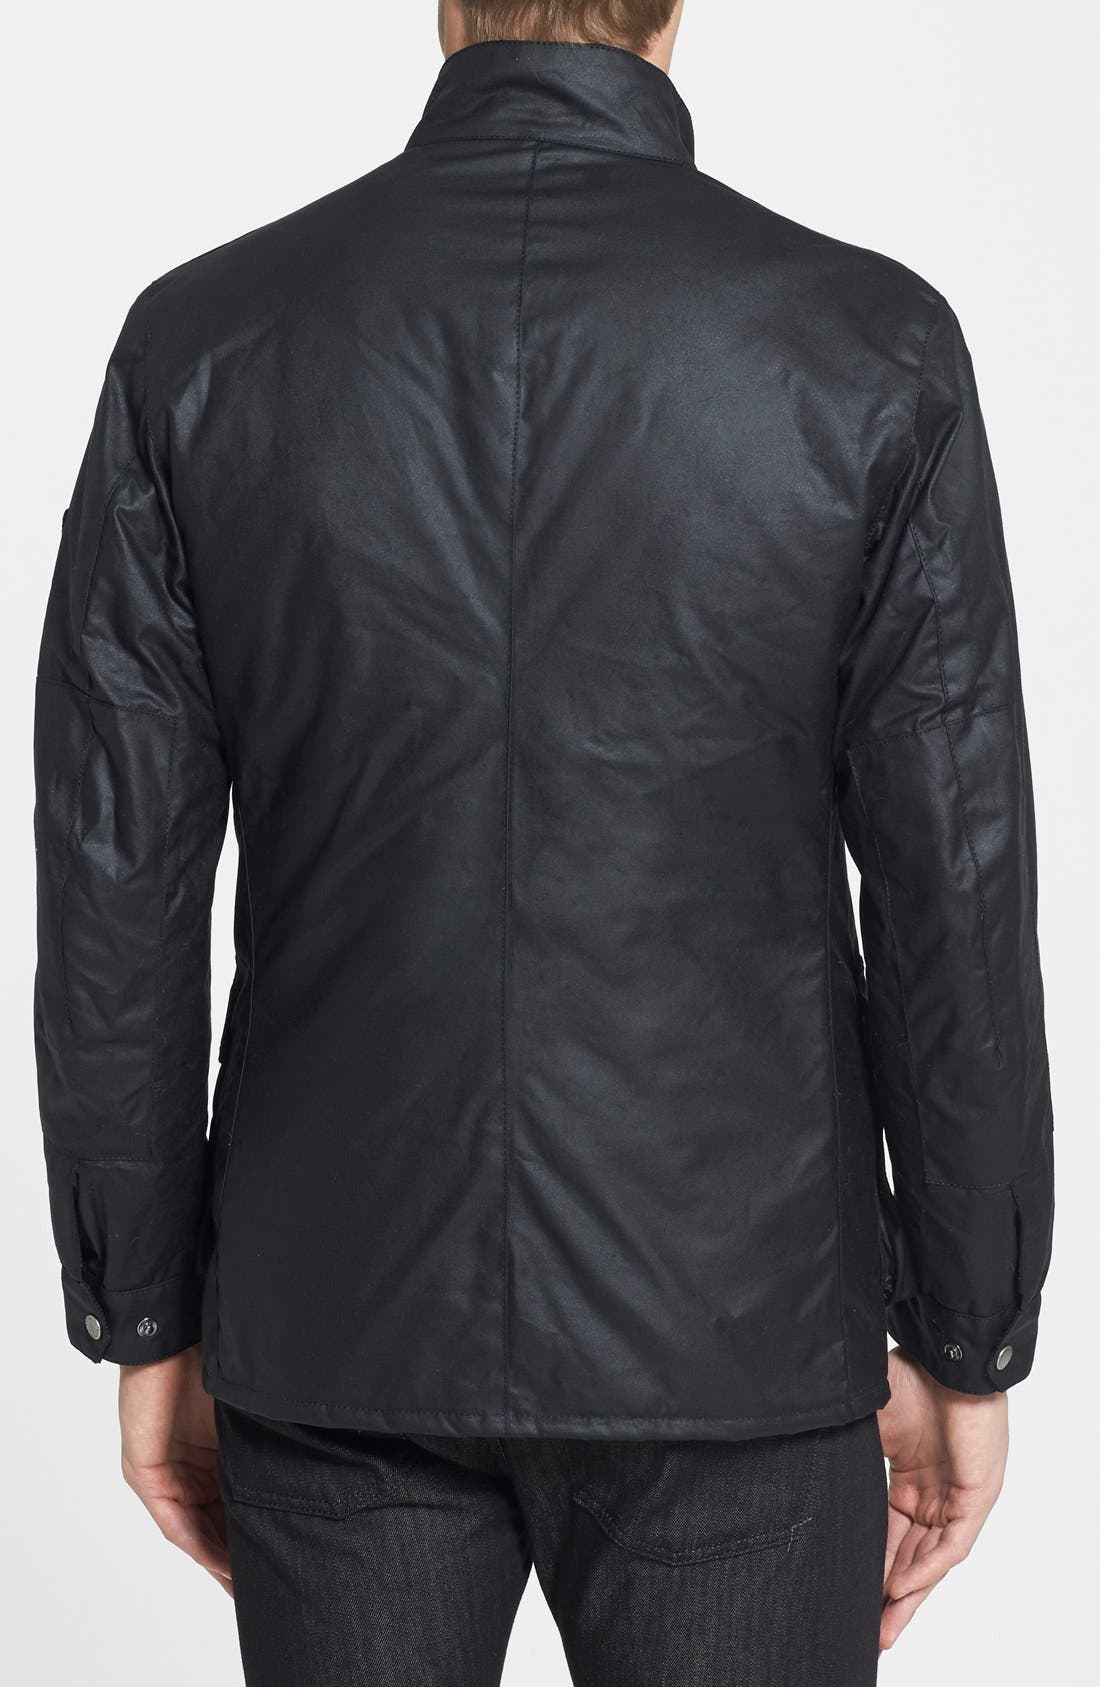 BARBOUR, 'Duke' Regular Fit Waterproof Waxed Cotton Jacket, Alternate thumbnail 2, color, BLACK